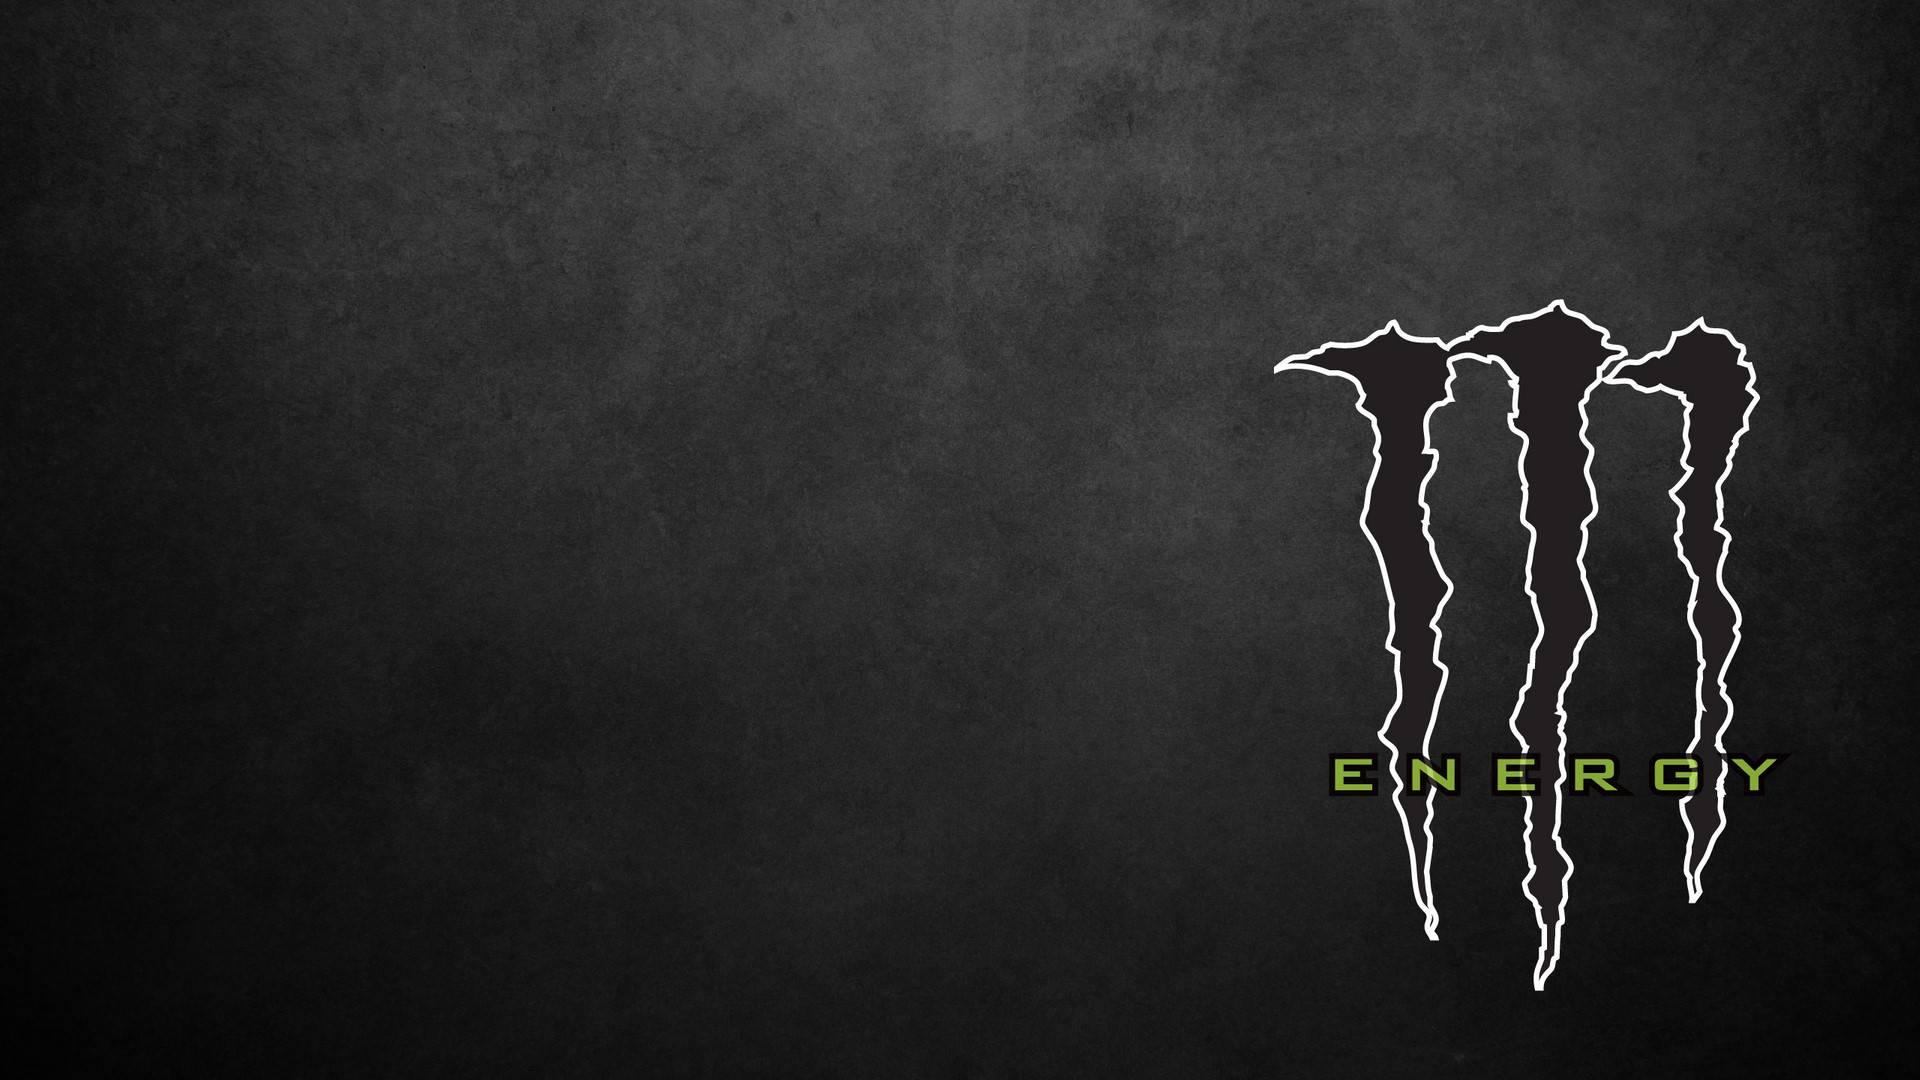 Monster-Desktop-Background-wallpaper-wpc5807344